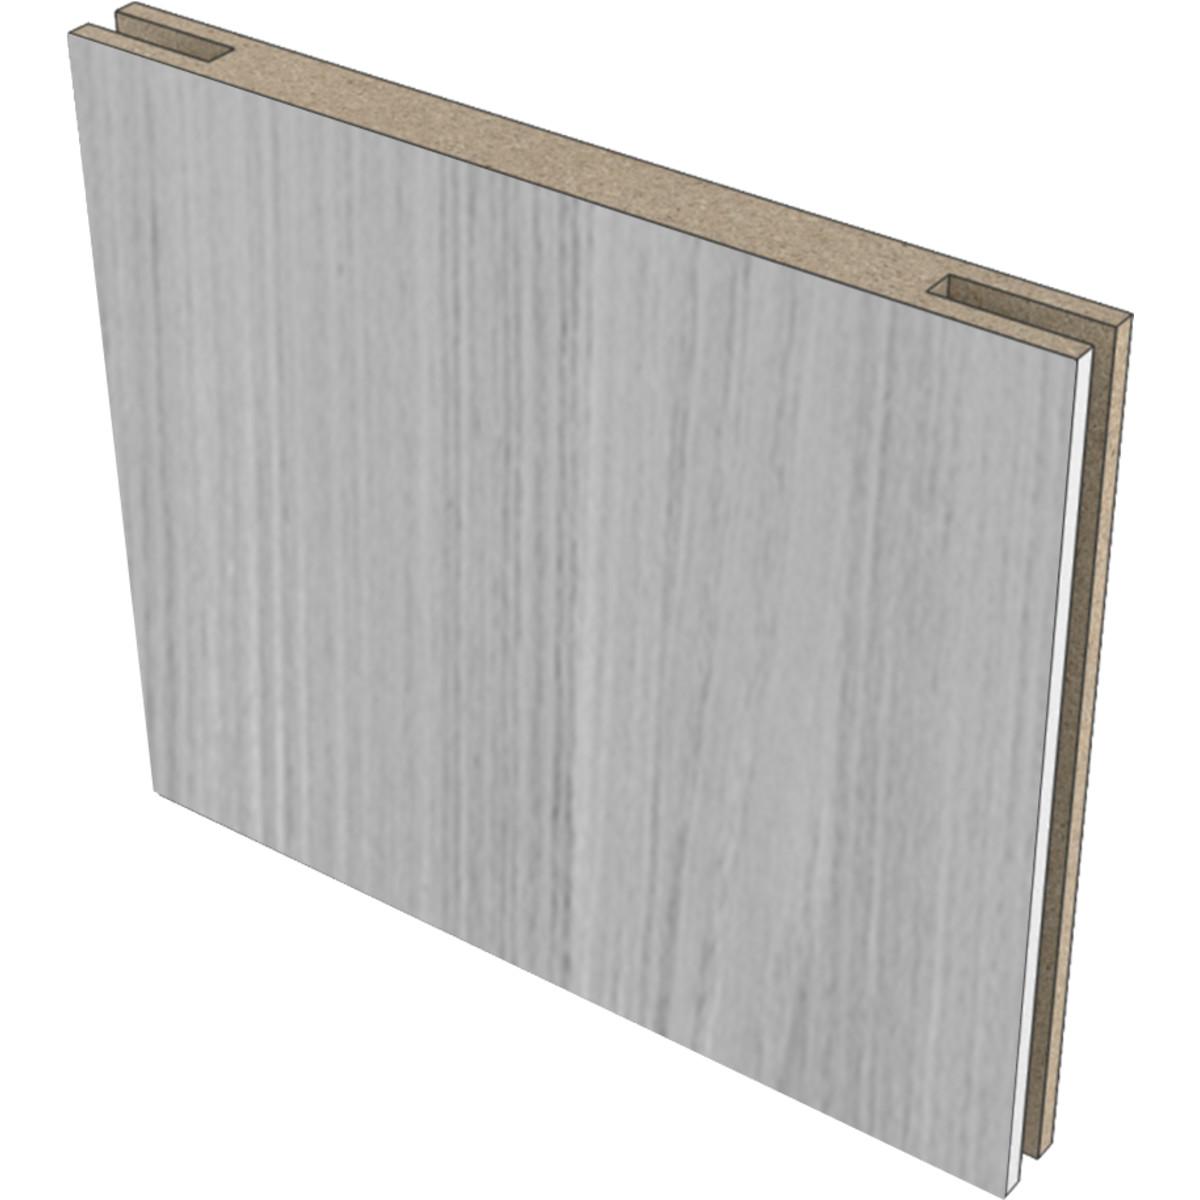 Добор дверной коробки «Техно» 150x10 мм МДФ/CPL цвет дуб светло-серый